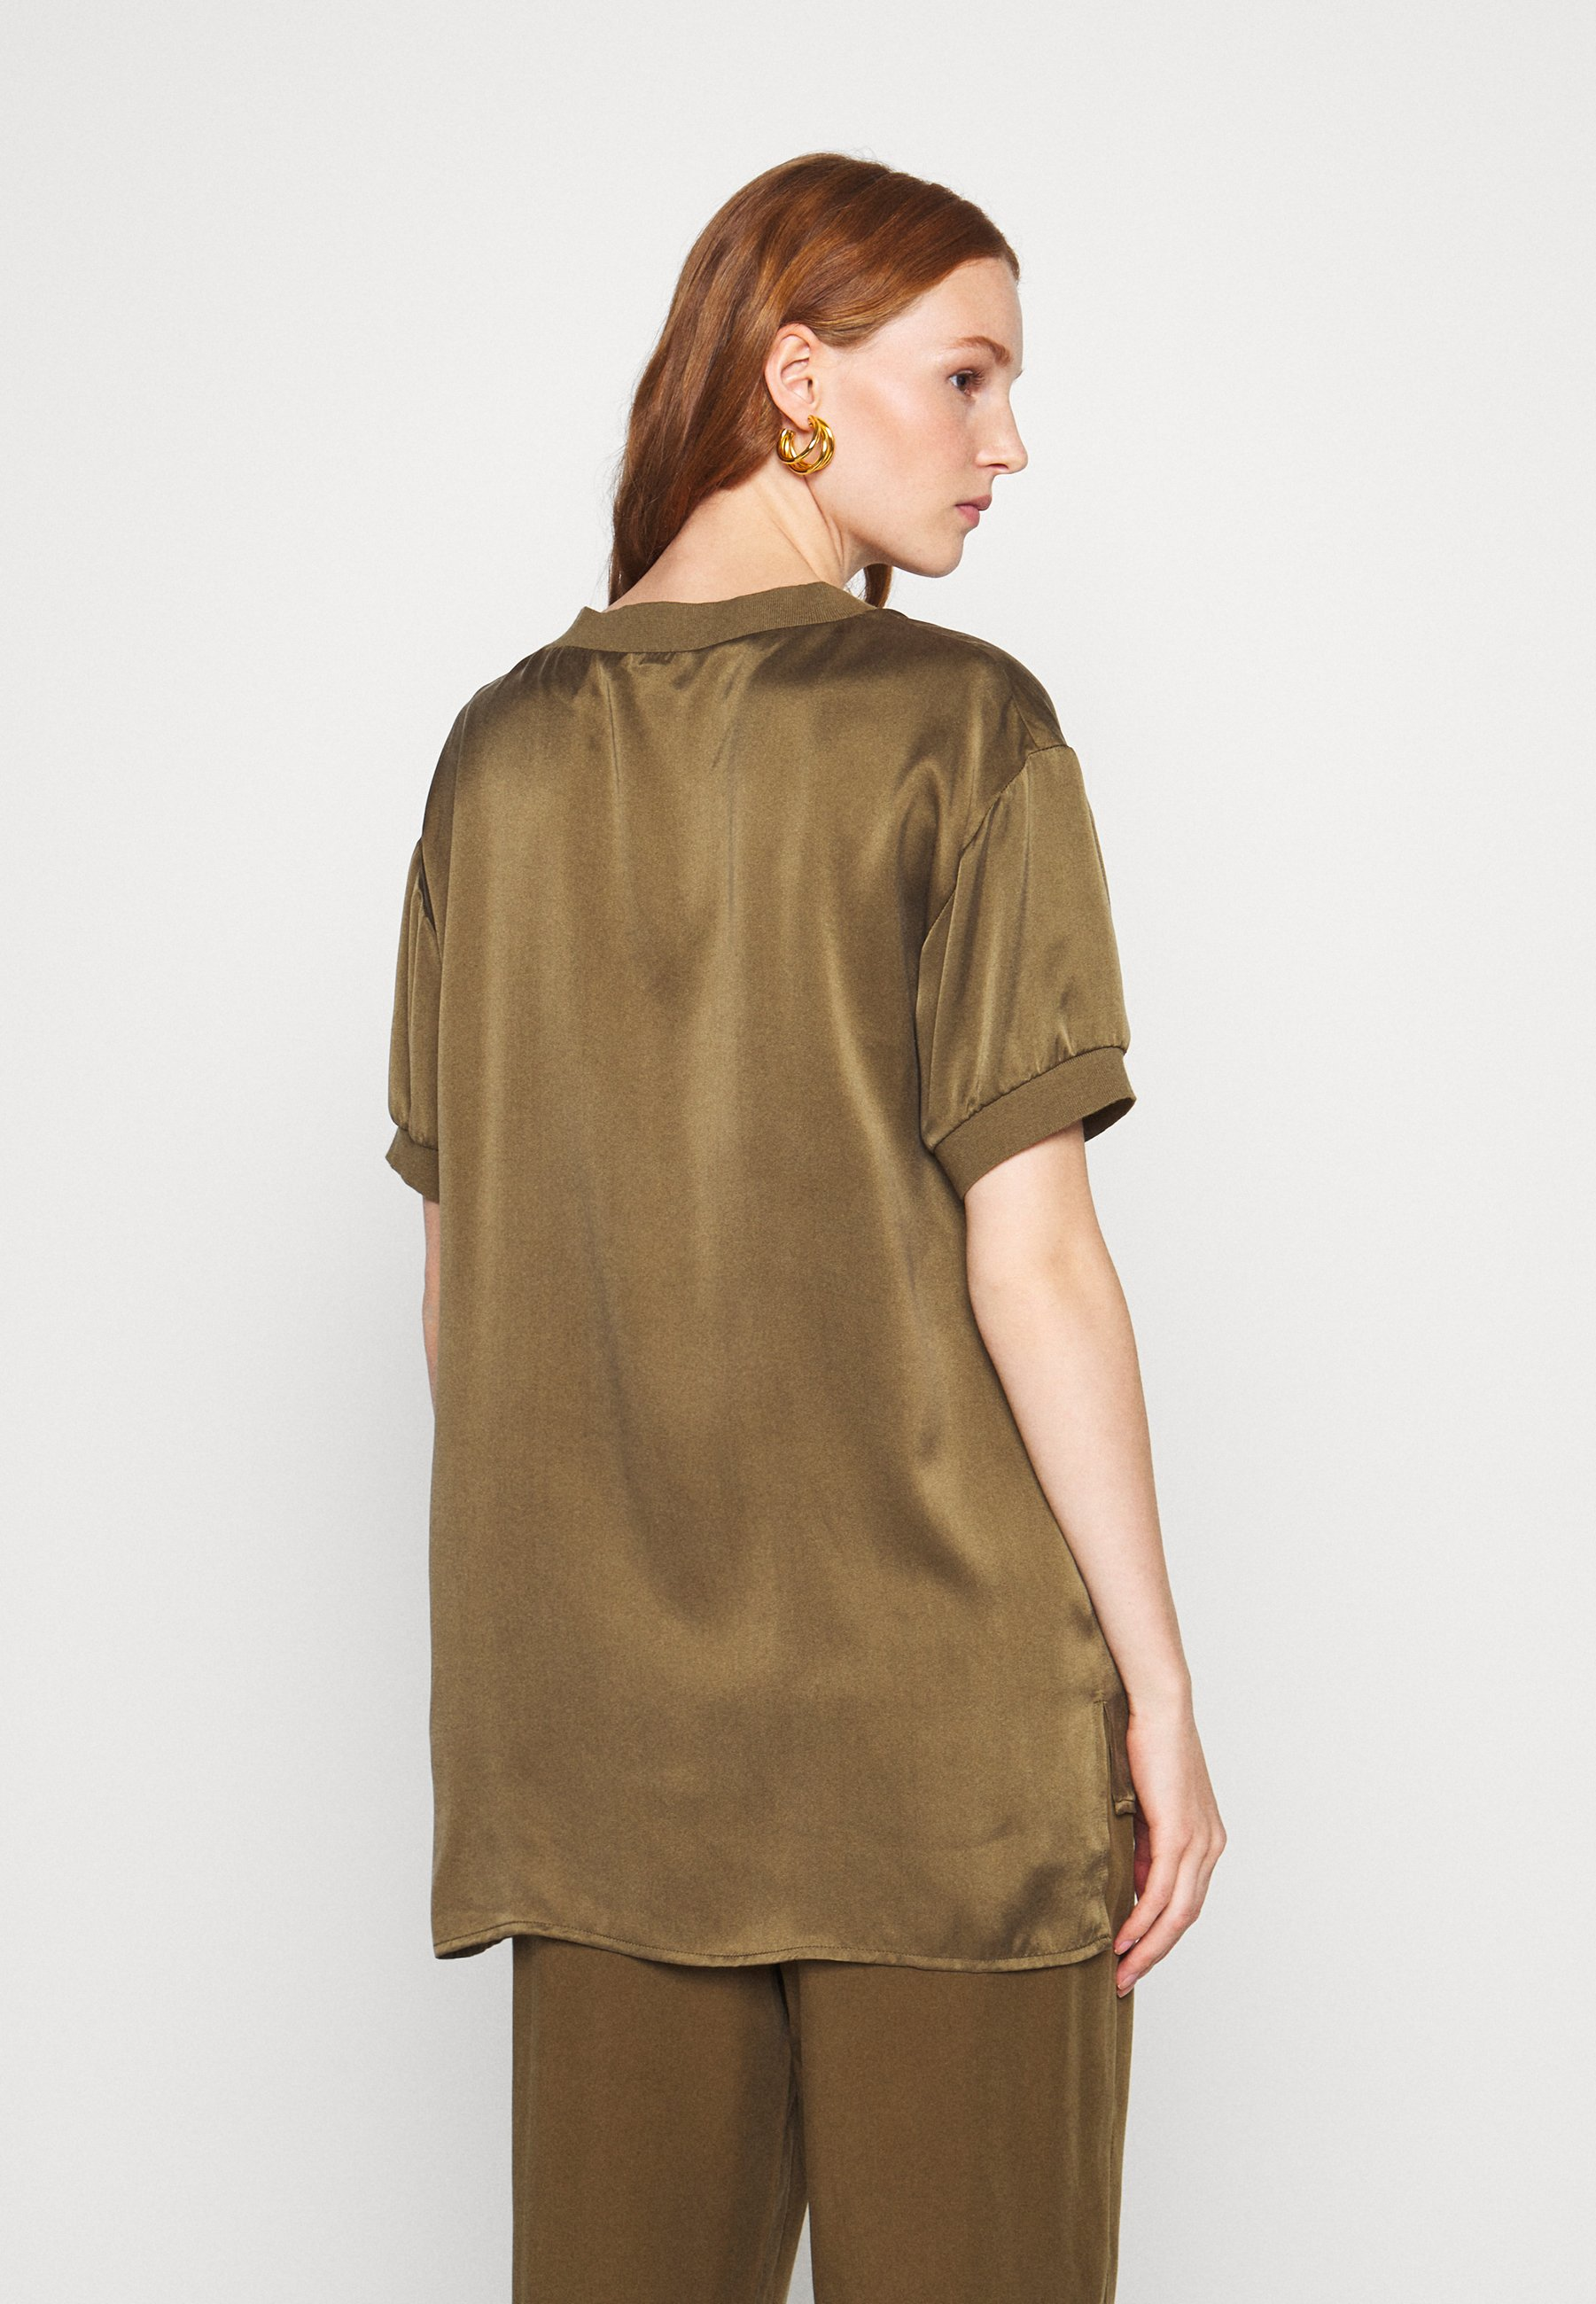 100% Guaranteed Women's Clothing Lounge Nine NEDA BLOUSE Blouse beech 4YPRdAiQh